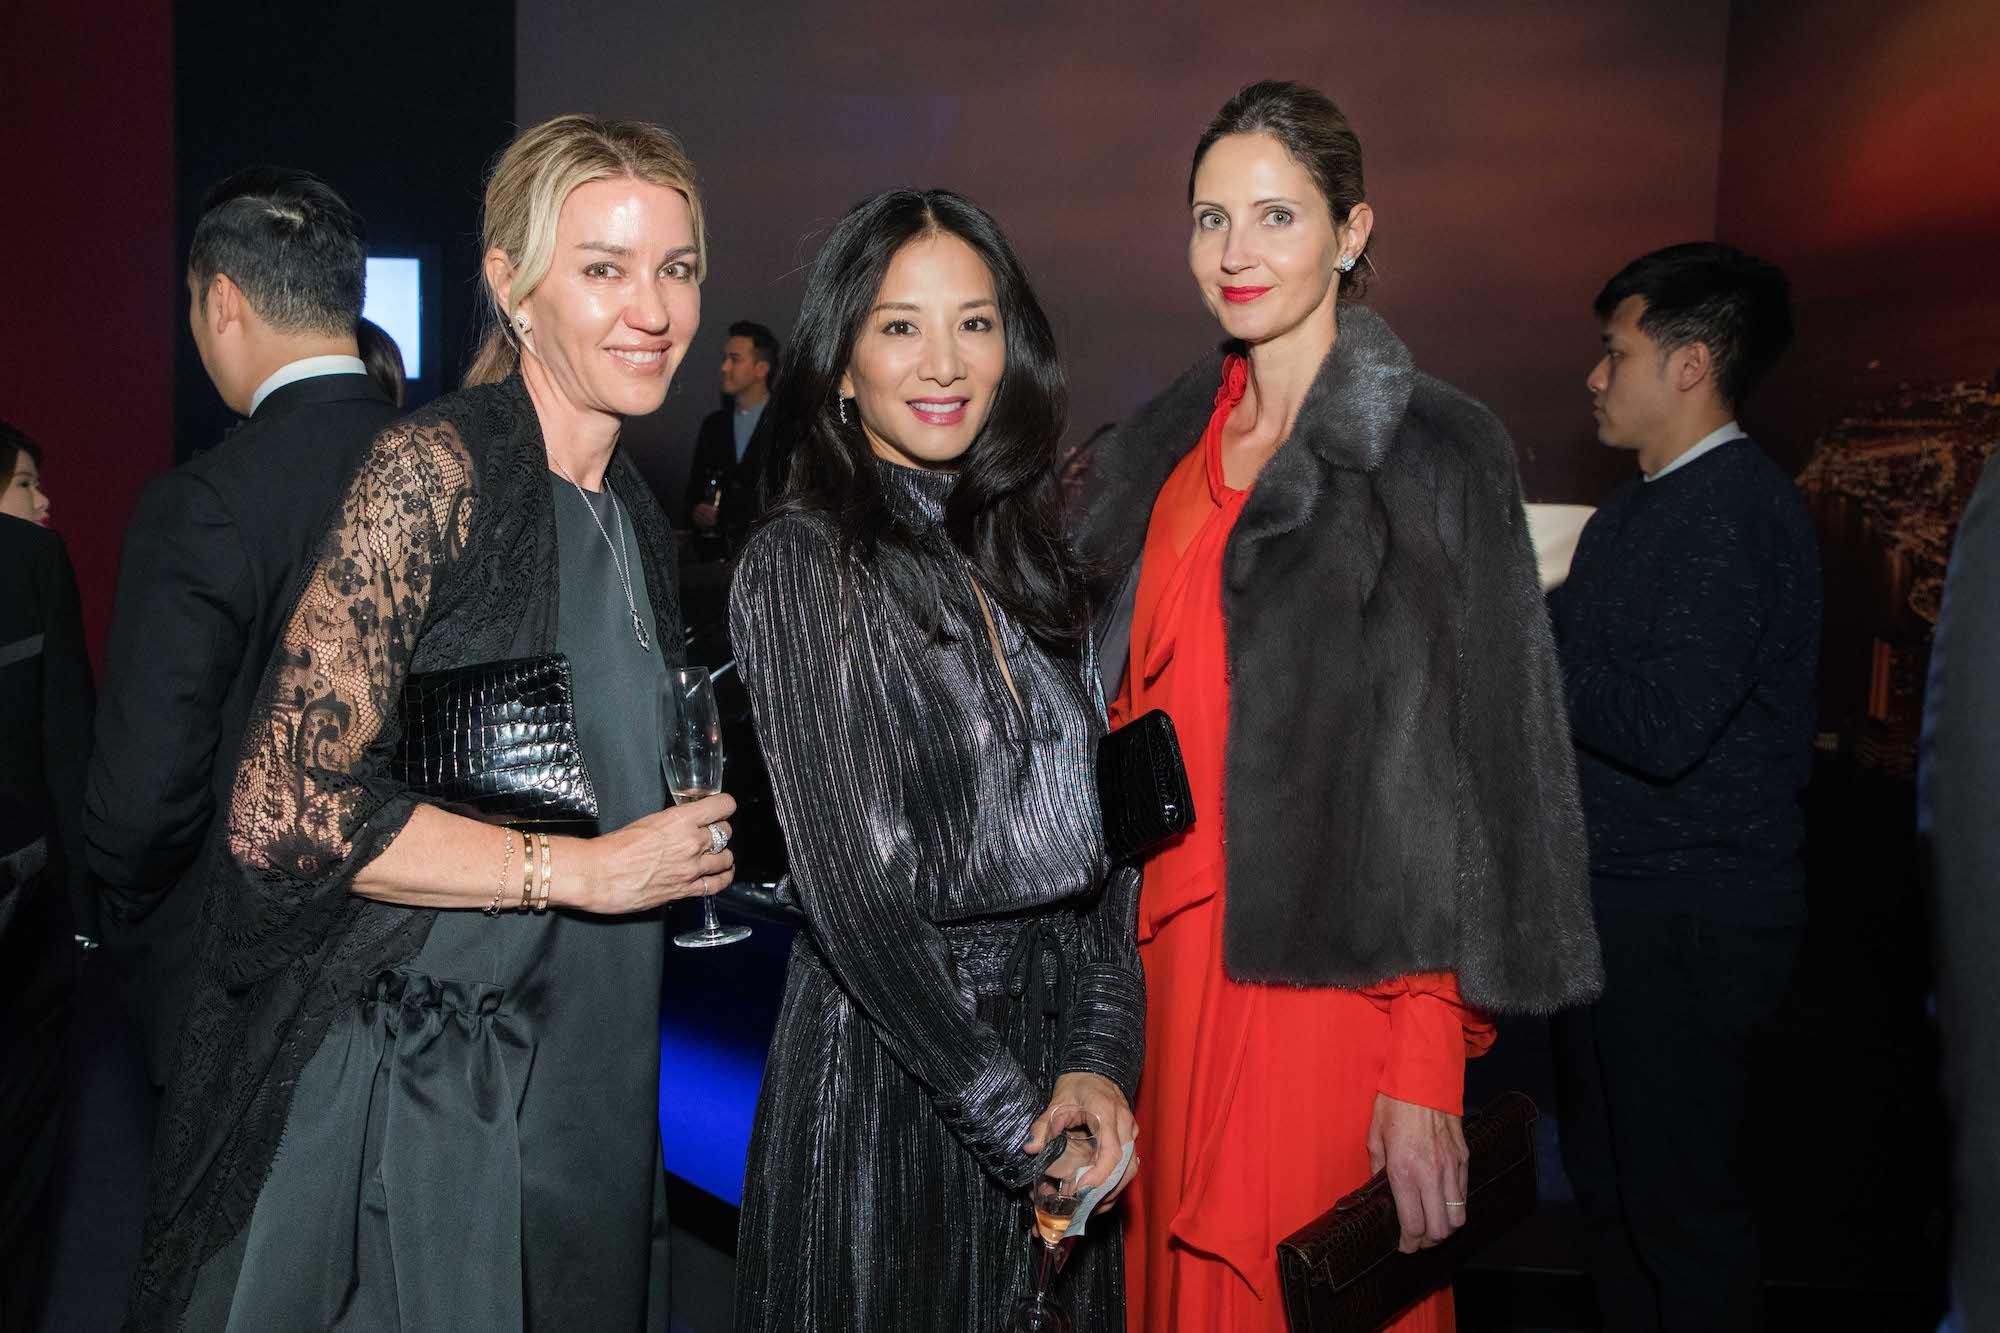 Lucy Bond-Marriott, Audry Ai-Morrow, Tamara Varga